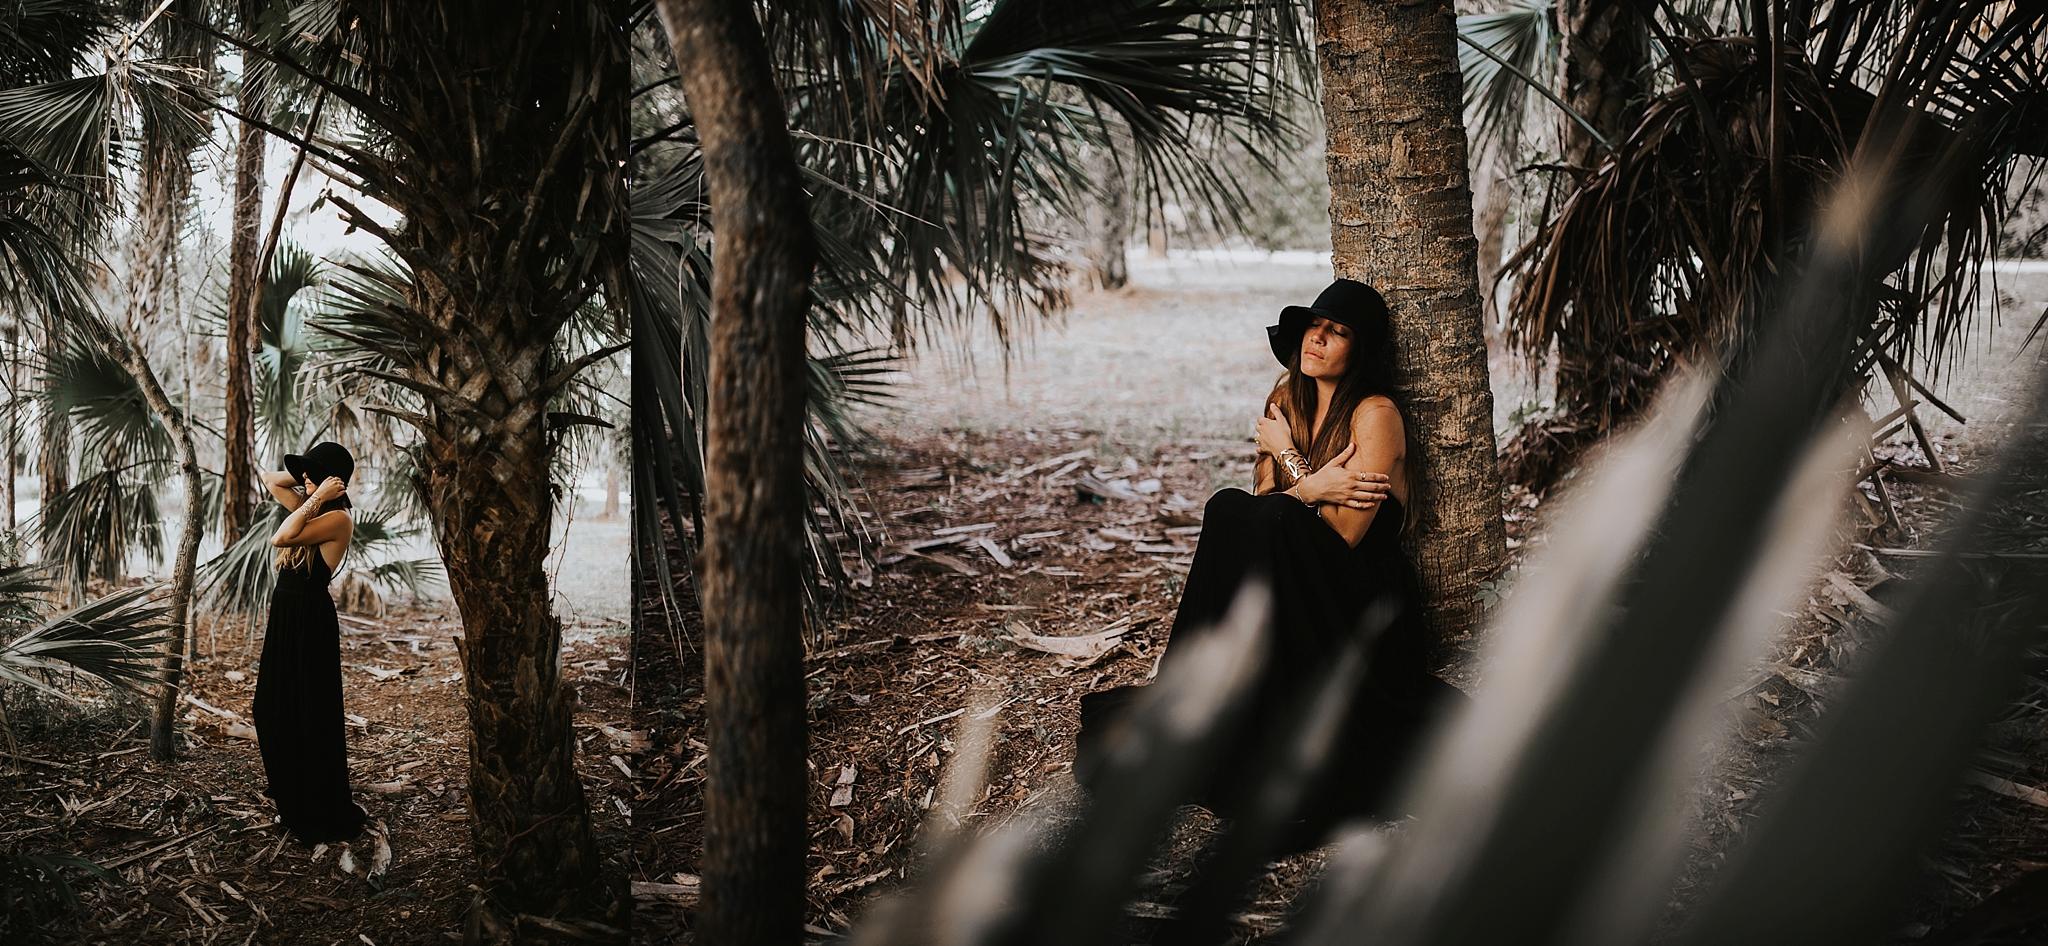 twyla jones photography - treasure coast - florida family photography riverbend park jupiter florida-5930.jpg